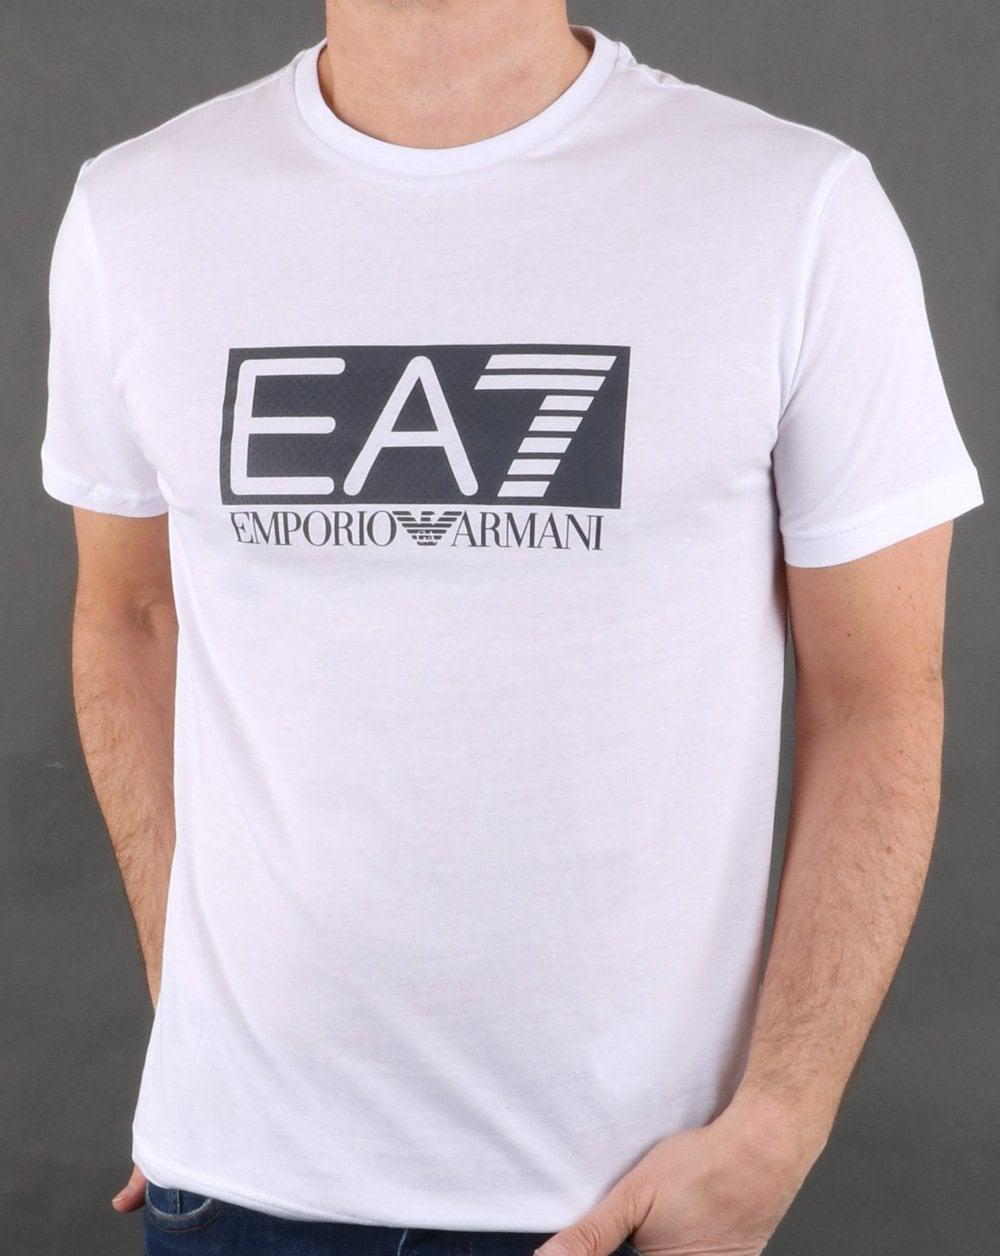 2cb568b1a Emporio Armani EA7 Emporio Armani EA7 Box Logo Tee White